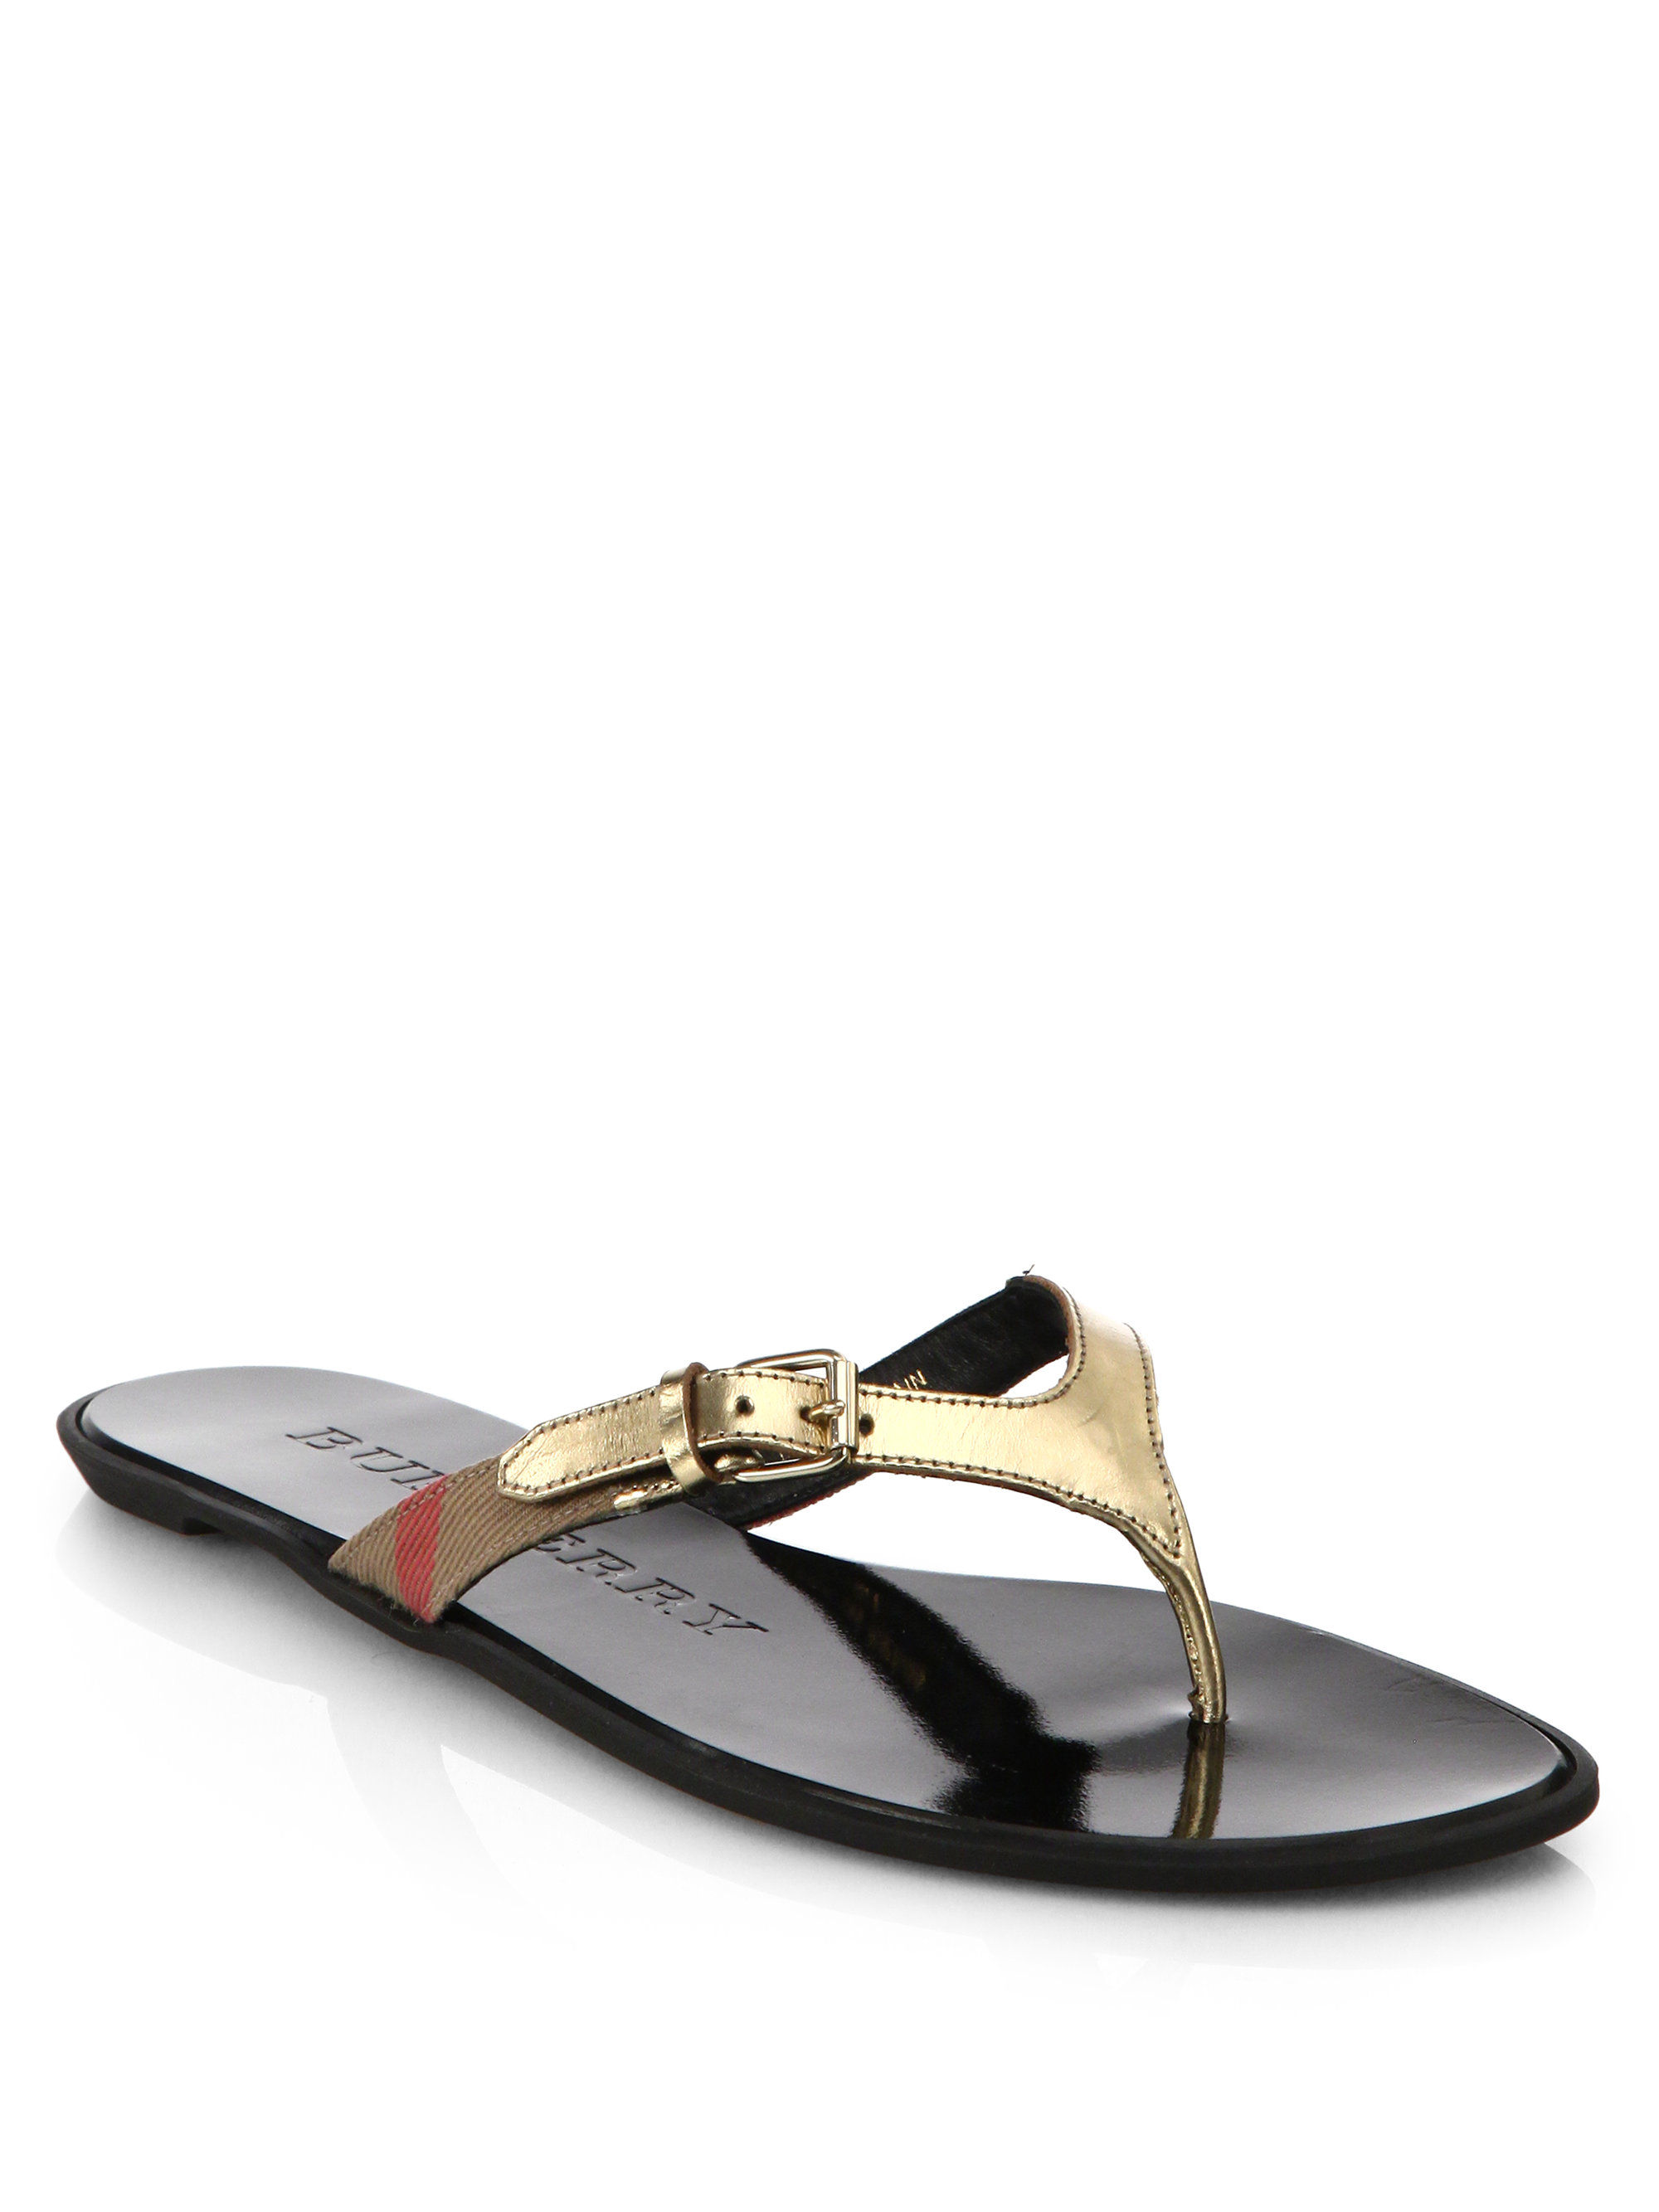 c0df7d244b1c Lyst - Burberry Masie Leather Flip Flops in Metallic for Men